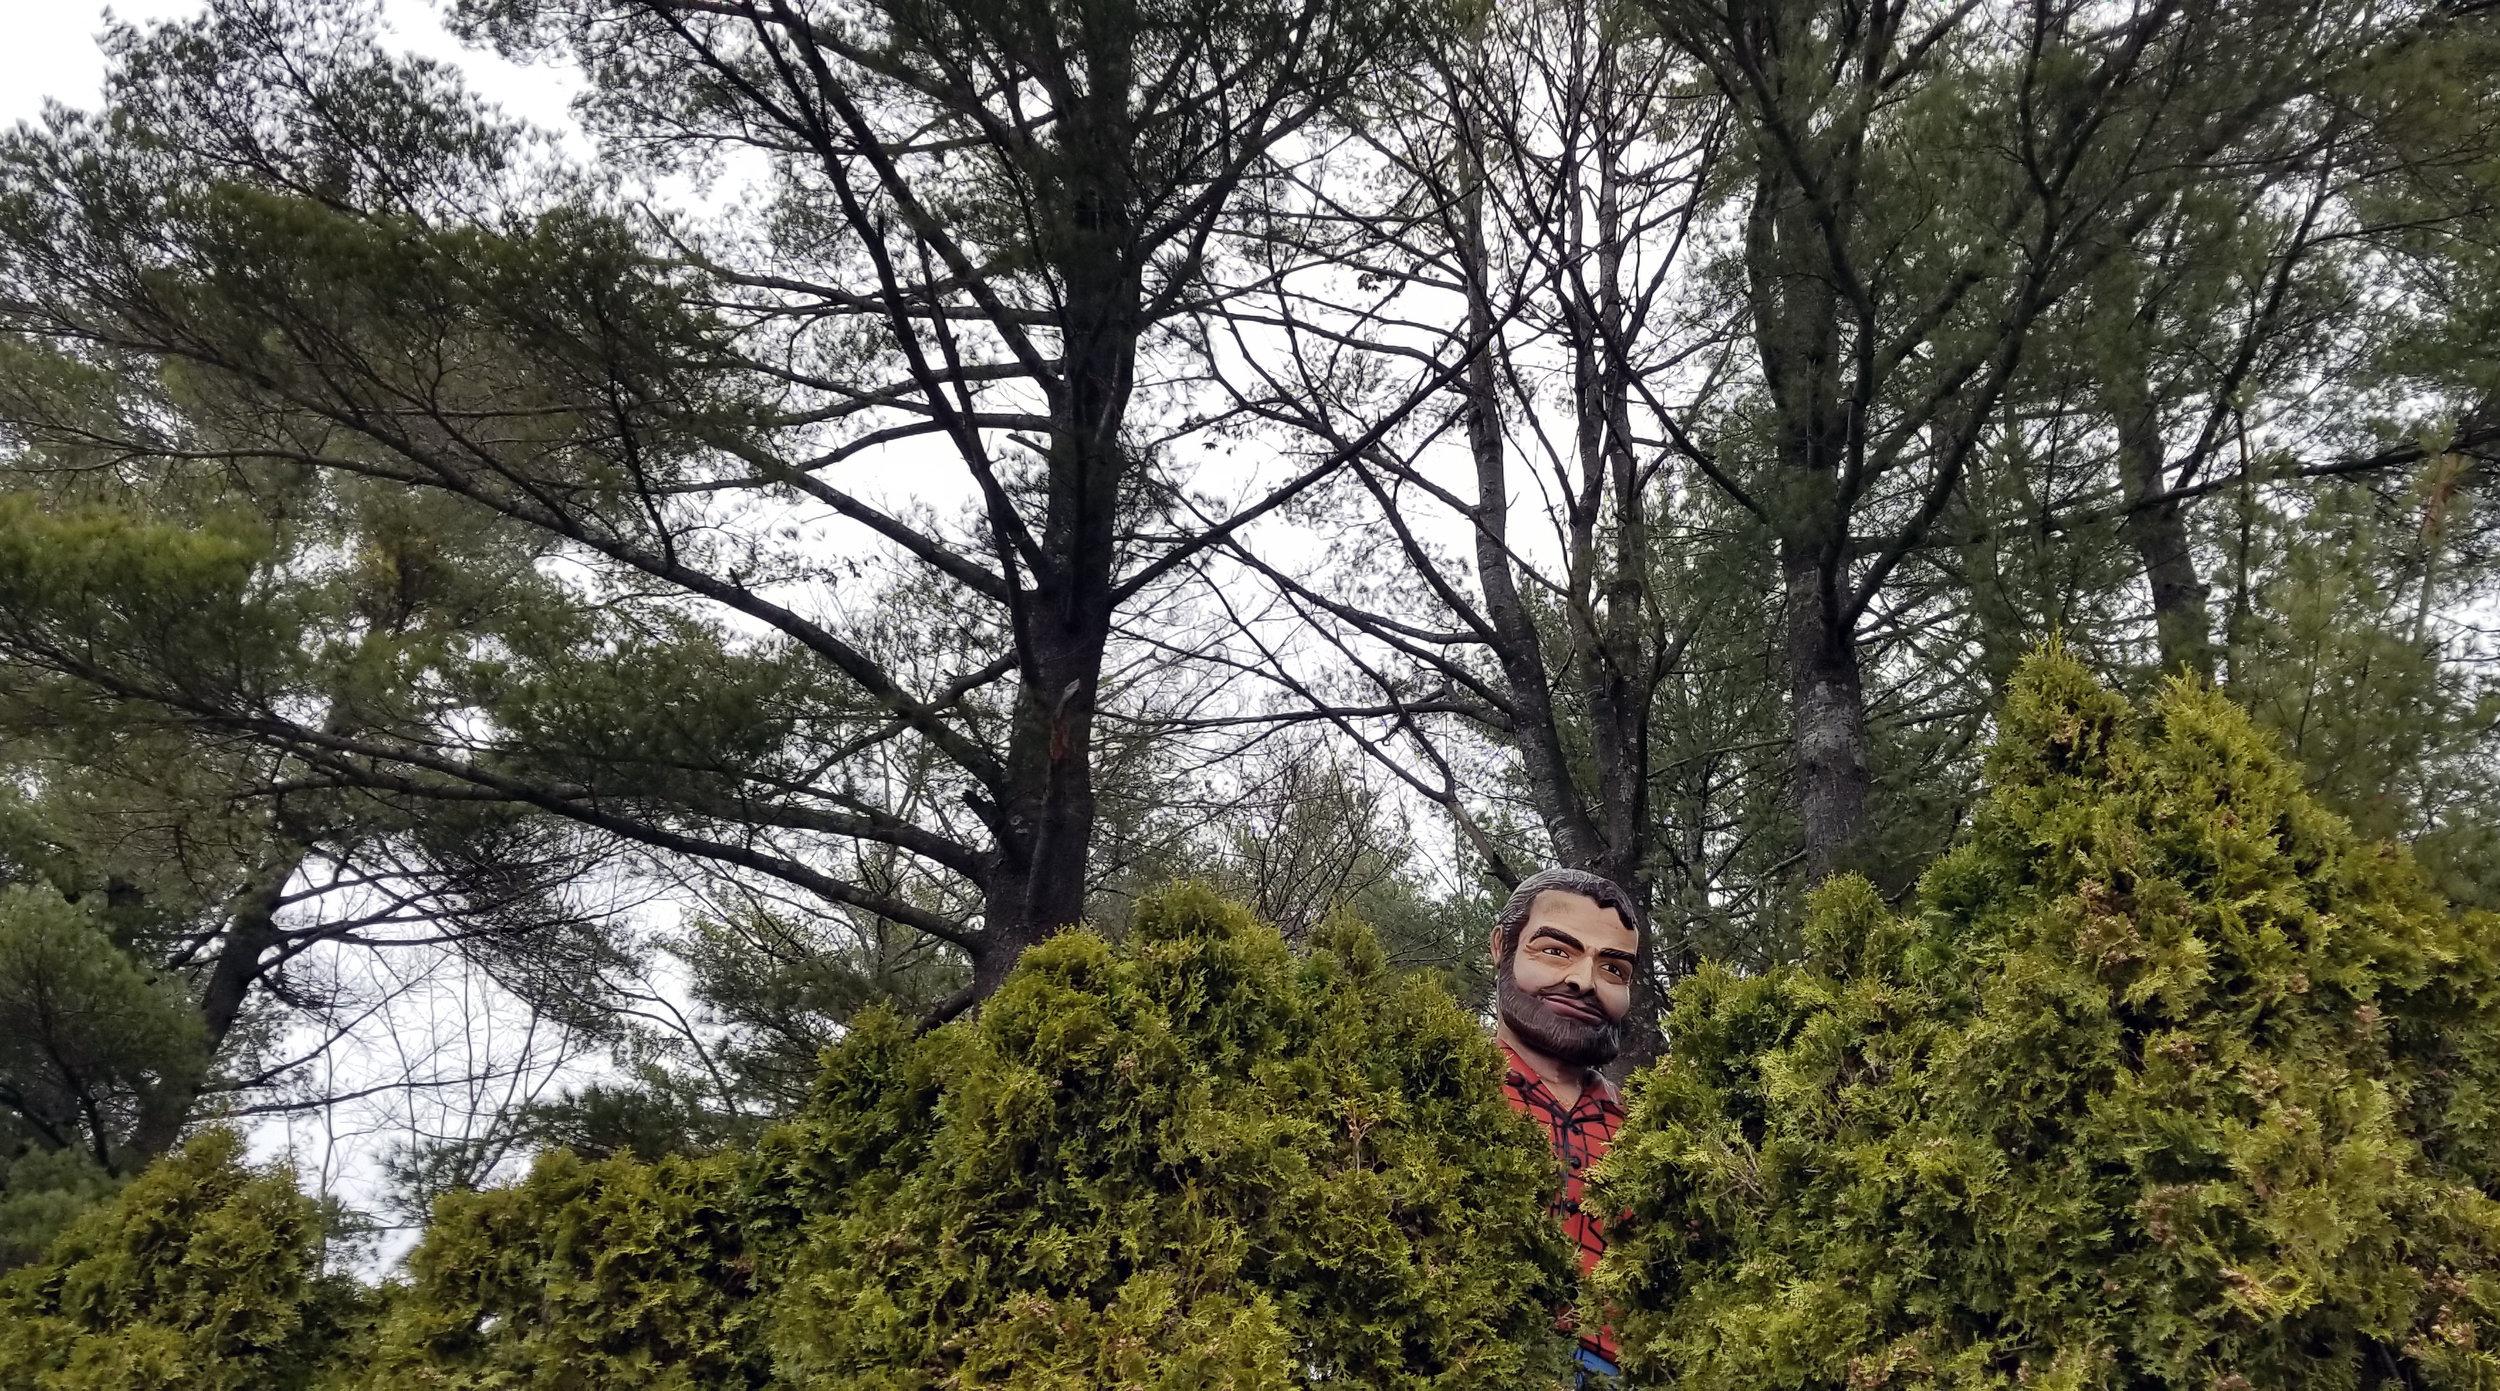 Lumberjack in the Magic Forest | Lake George, NY